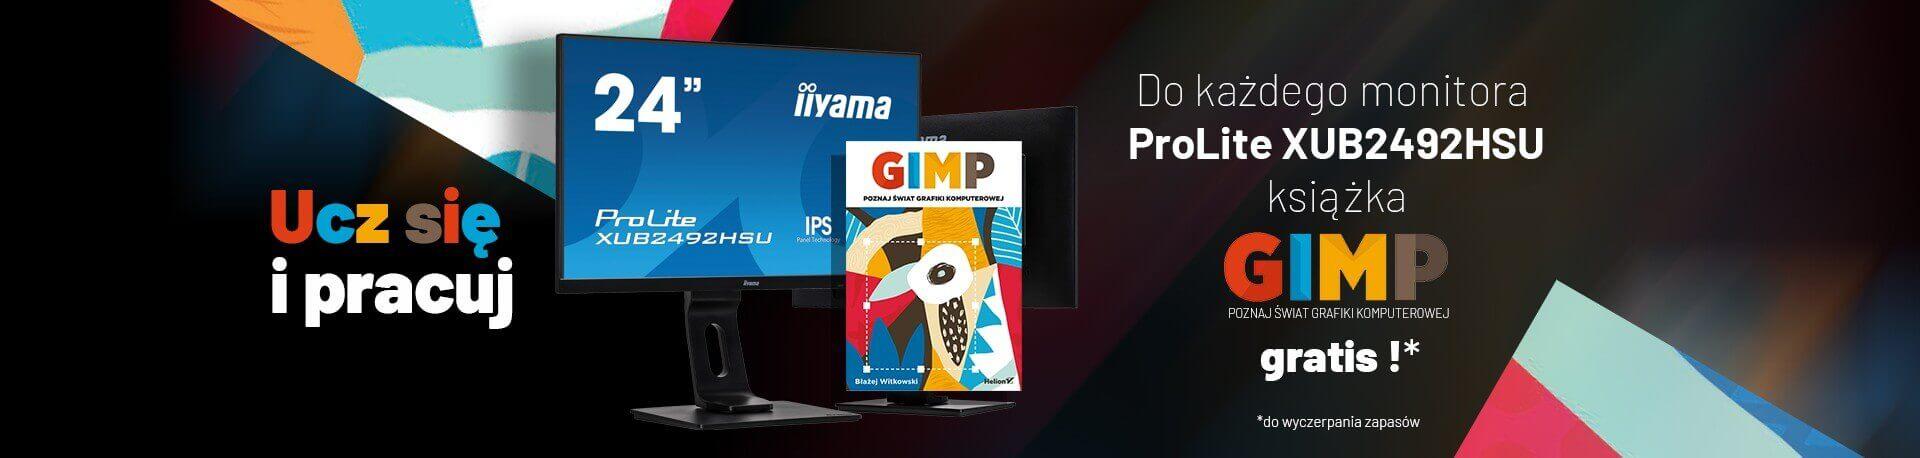 Książka GIMP gratis